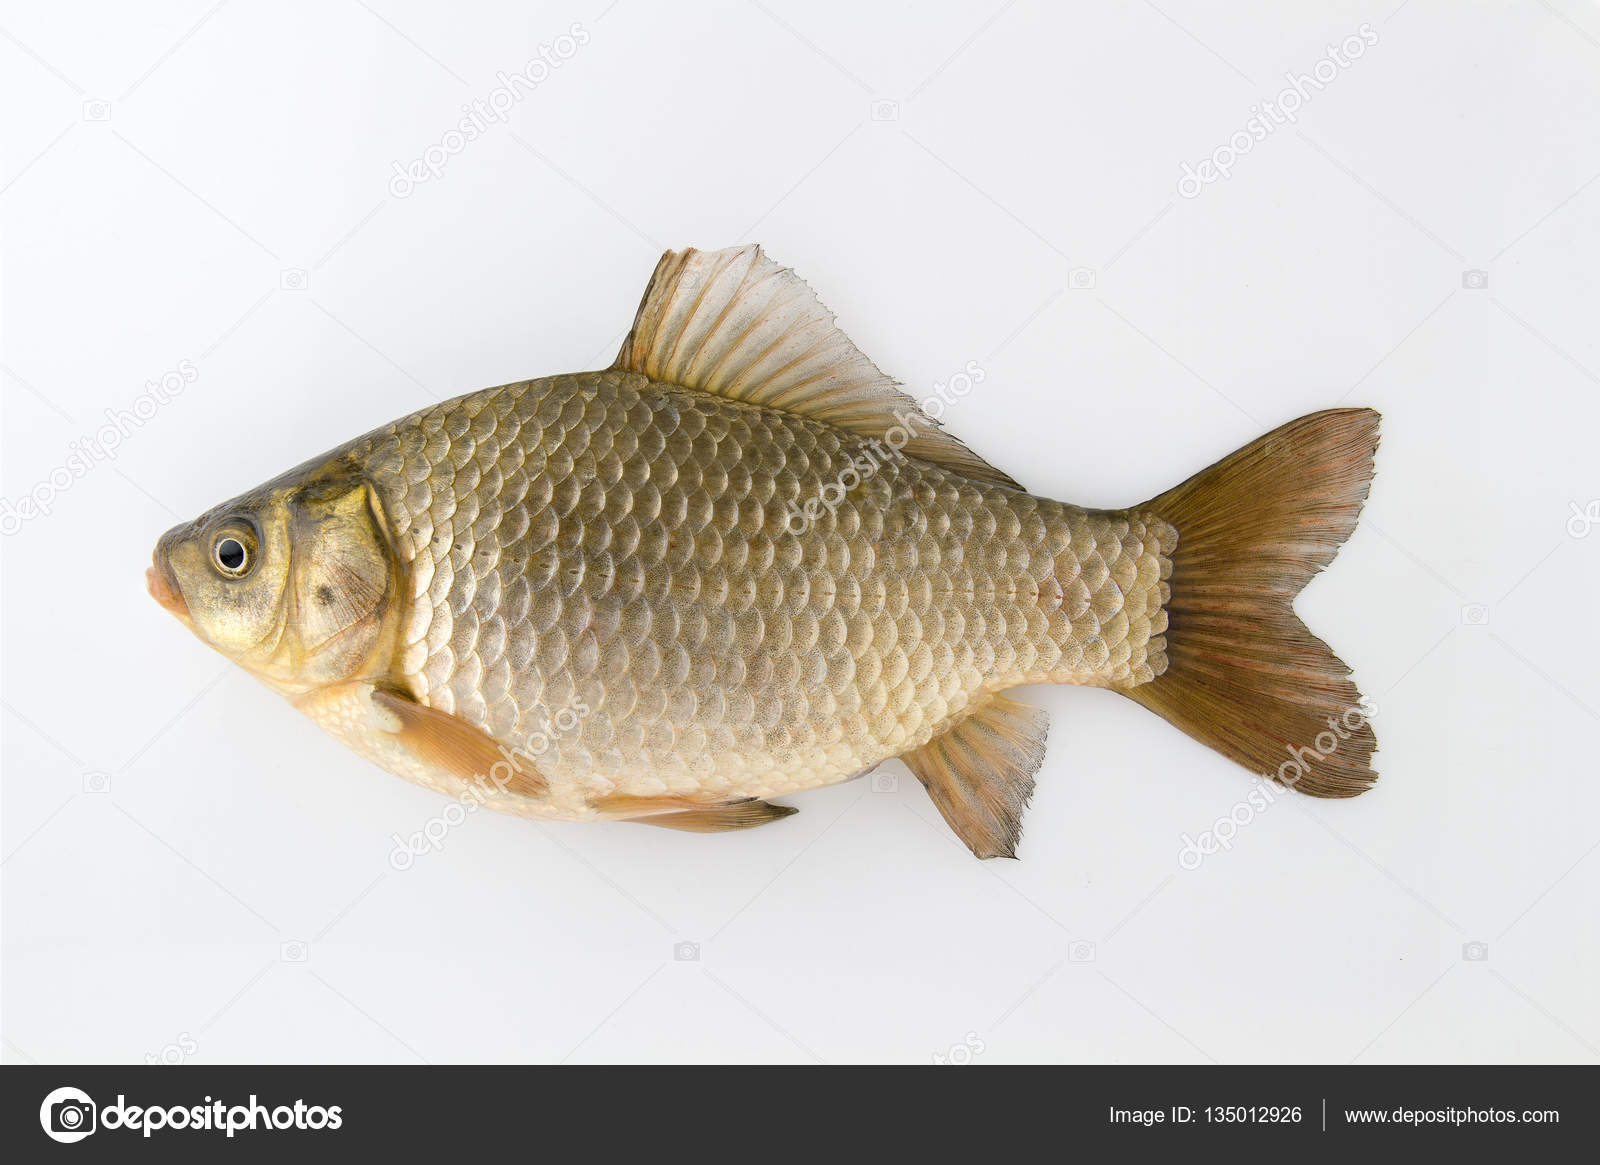 Silver Carp Fish | Live Fish Silver Carp Stock Photo C Oleg Skirta Yandex Ru 135012926